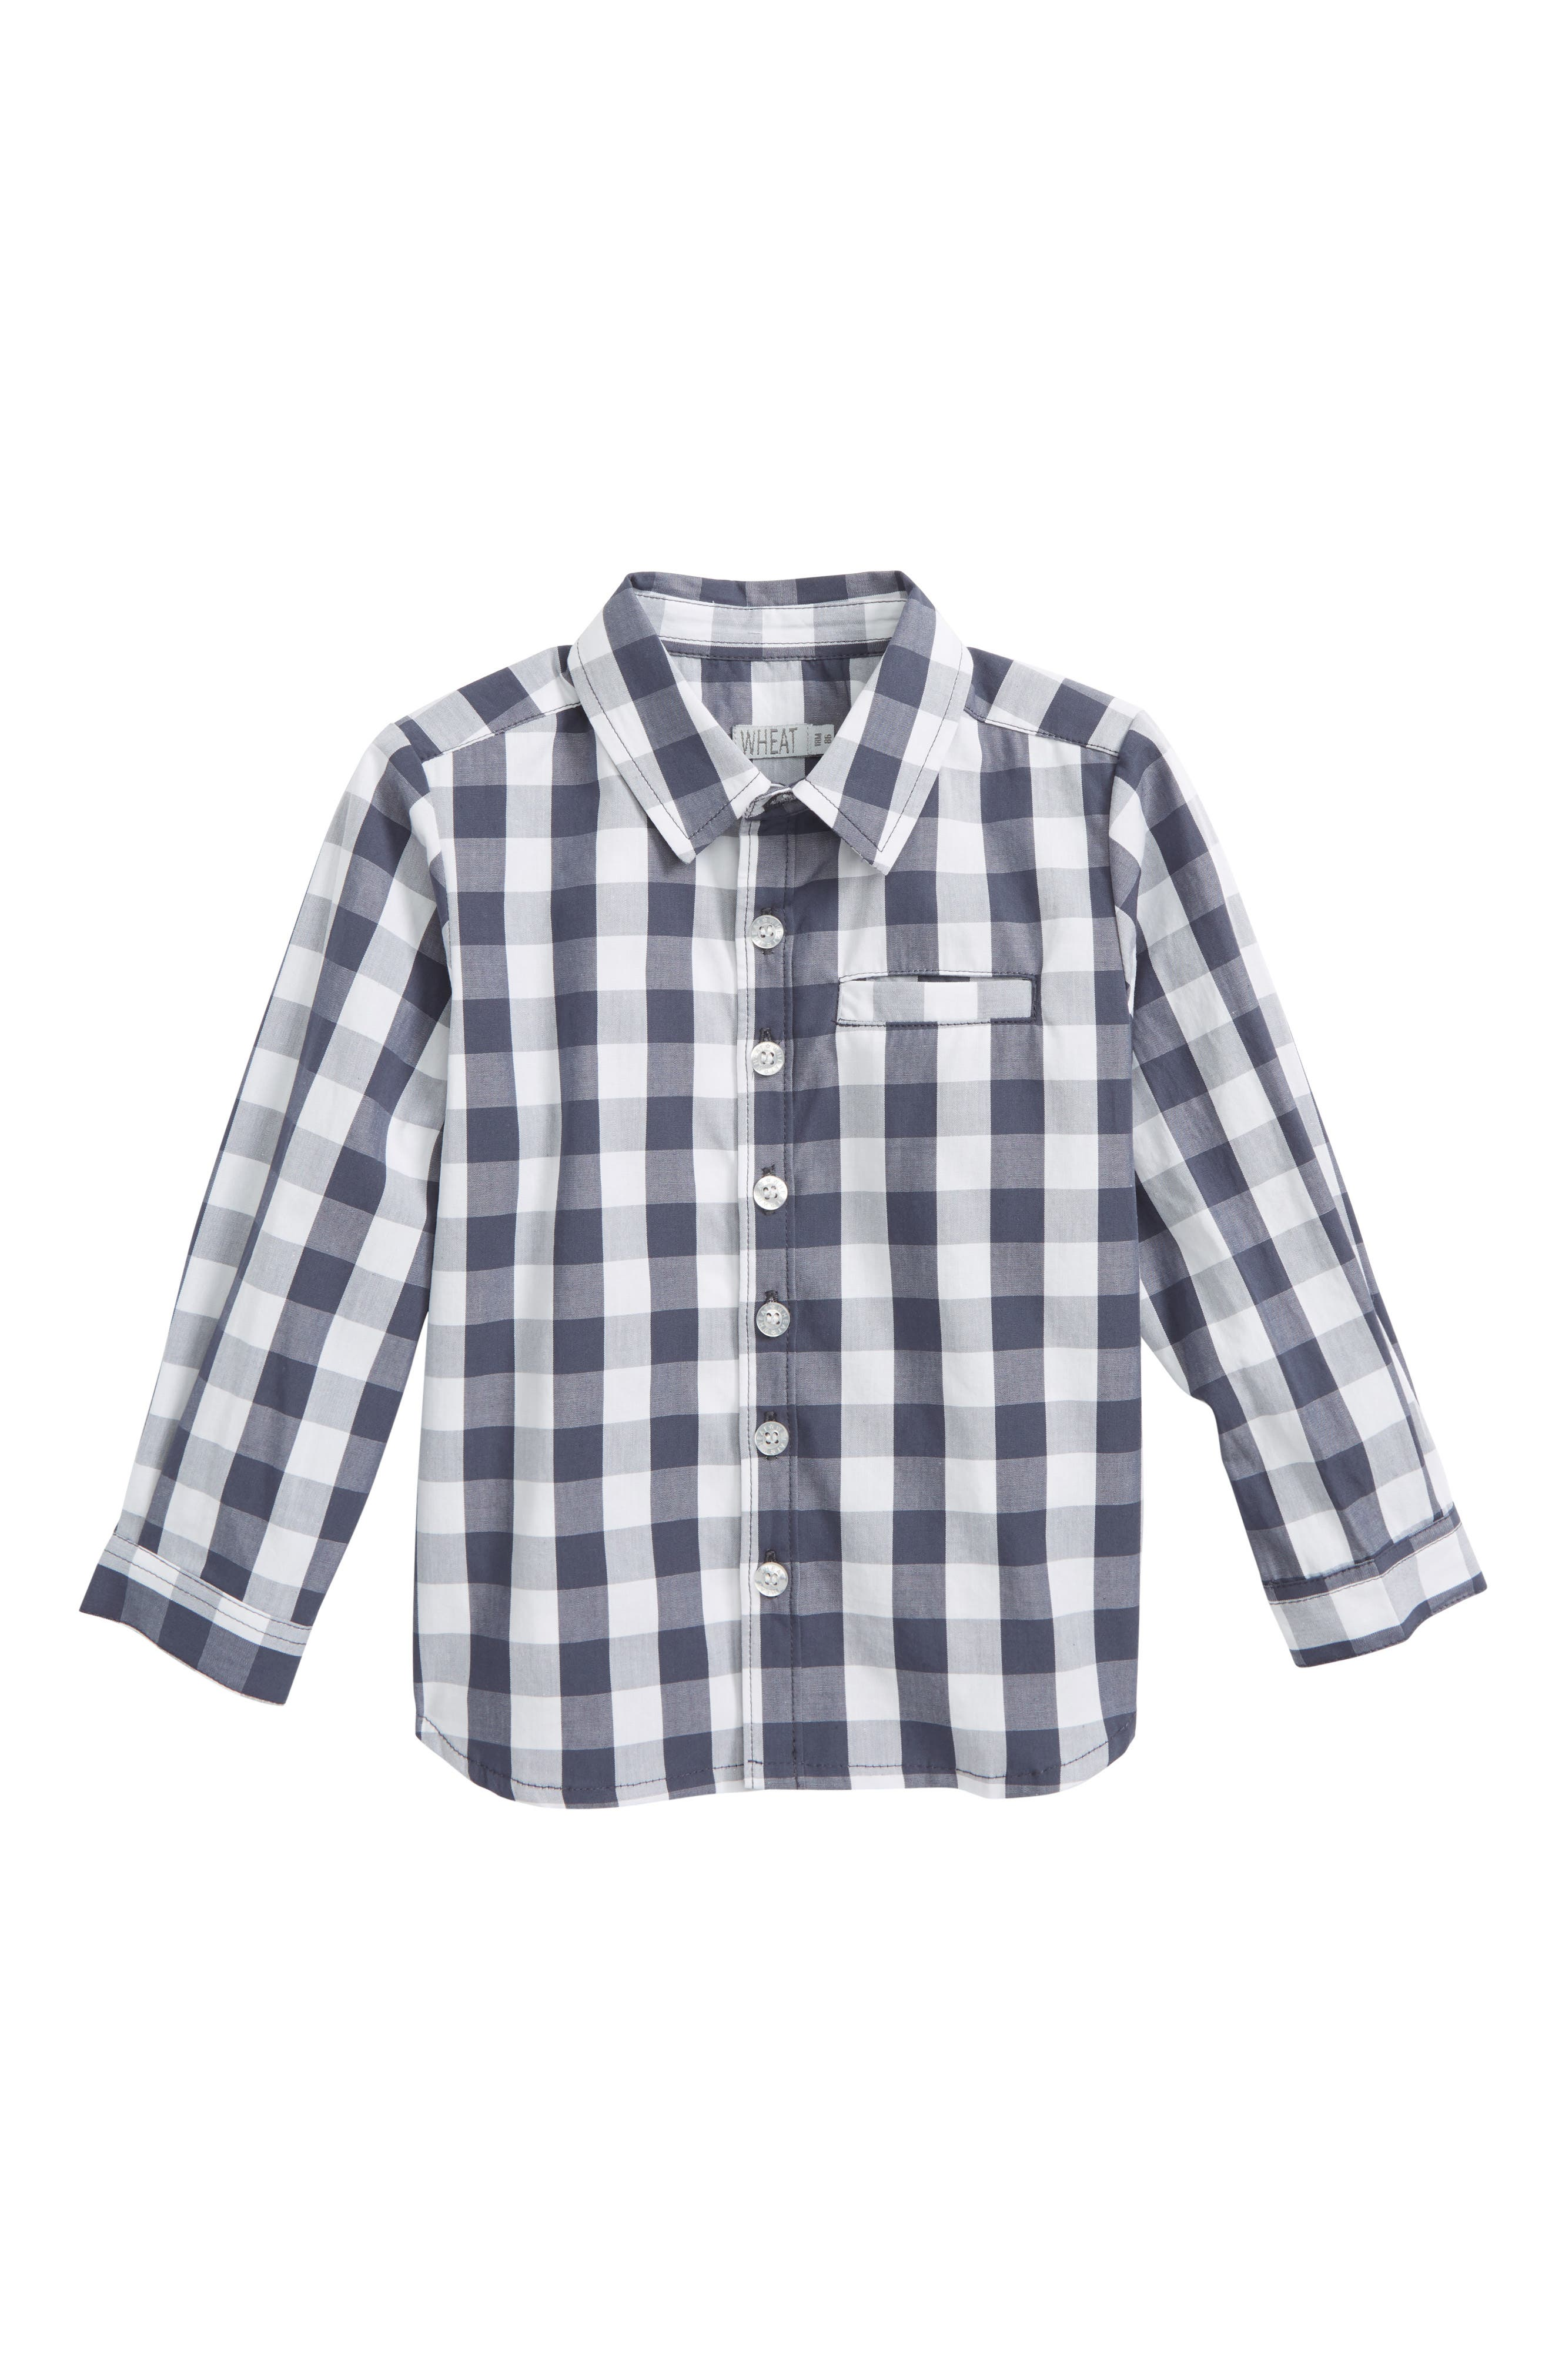 Ellias Check Shirt,                         Main,                         color, Greyblue